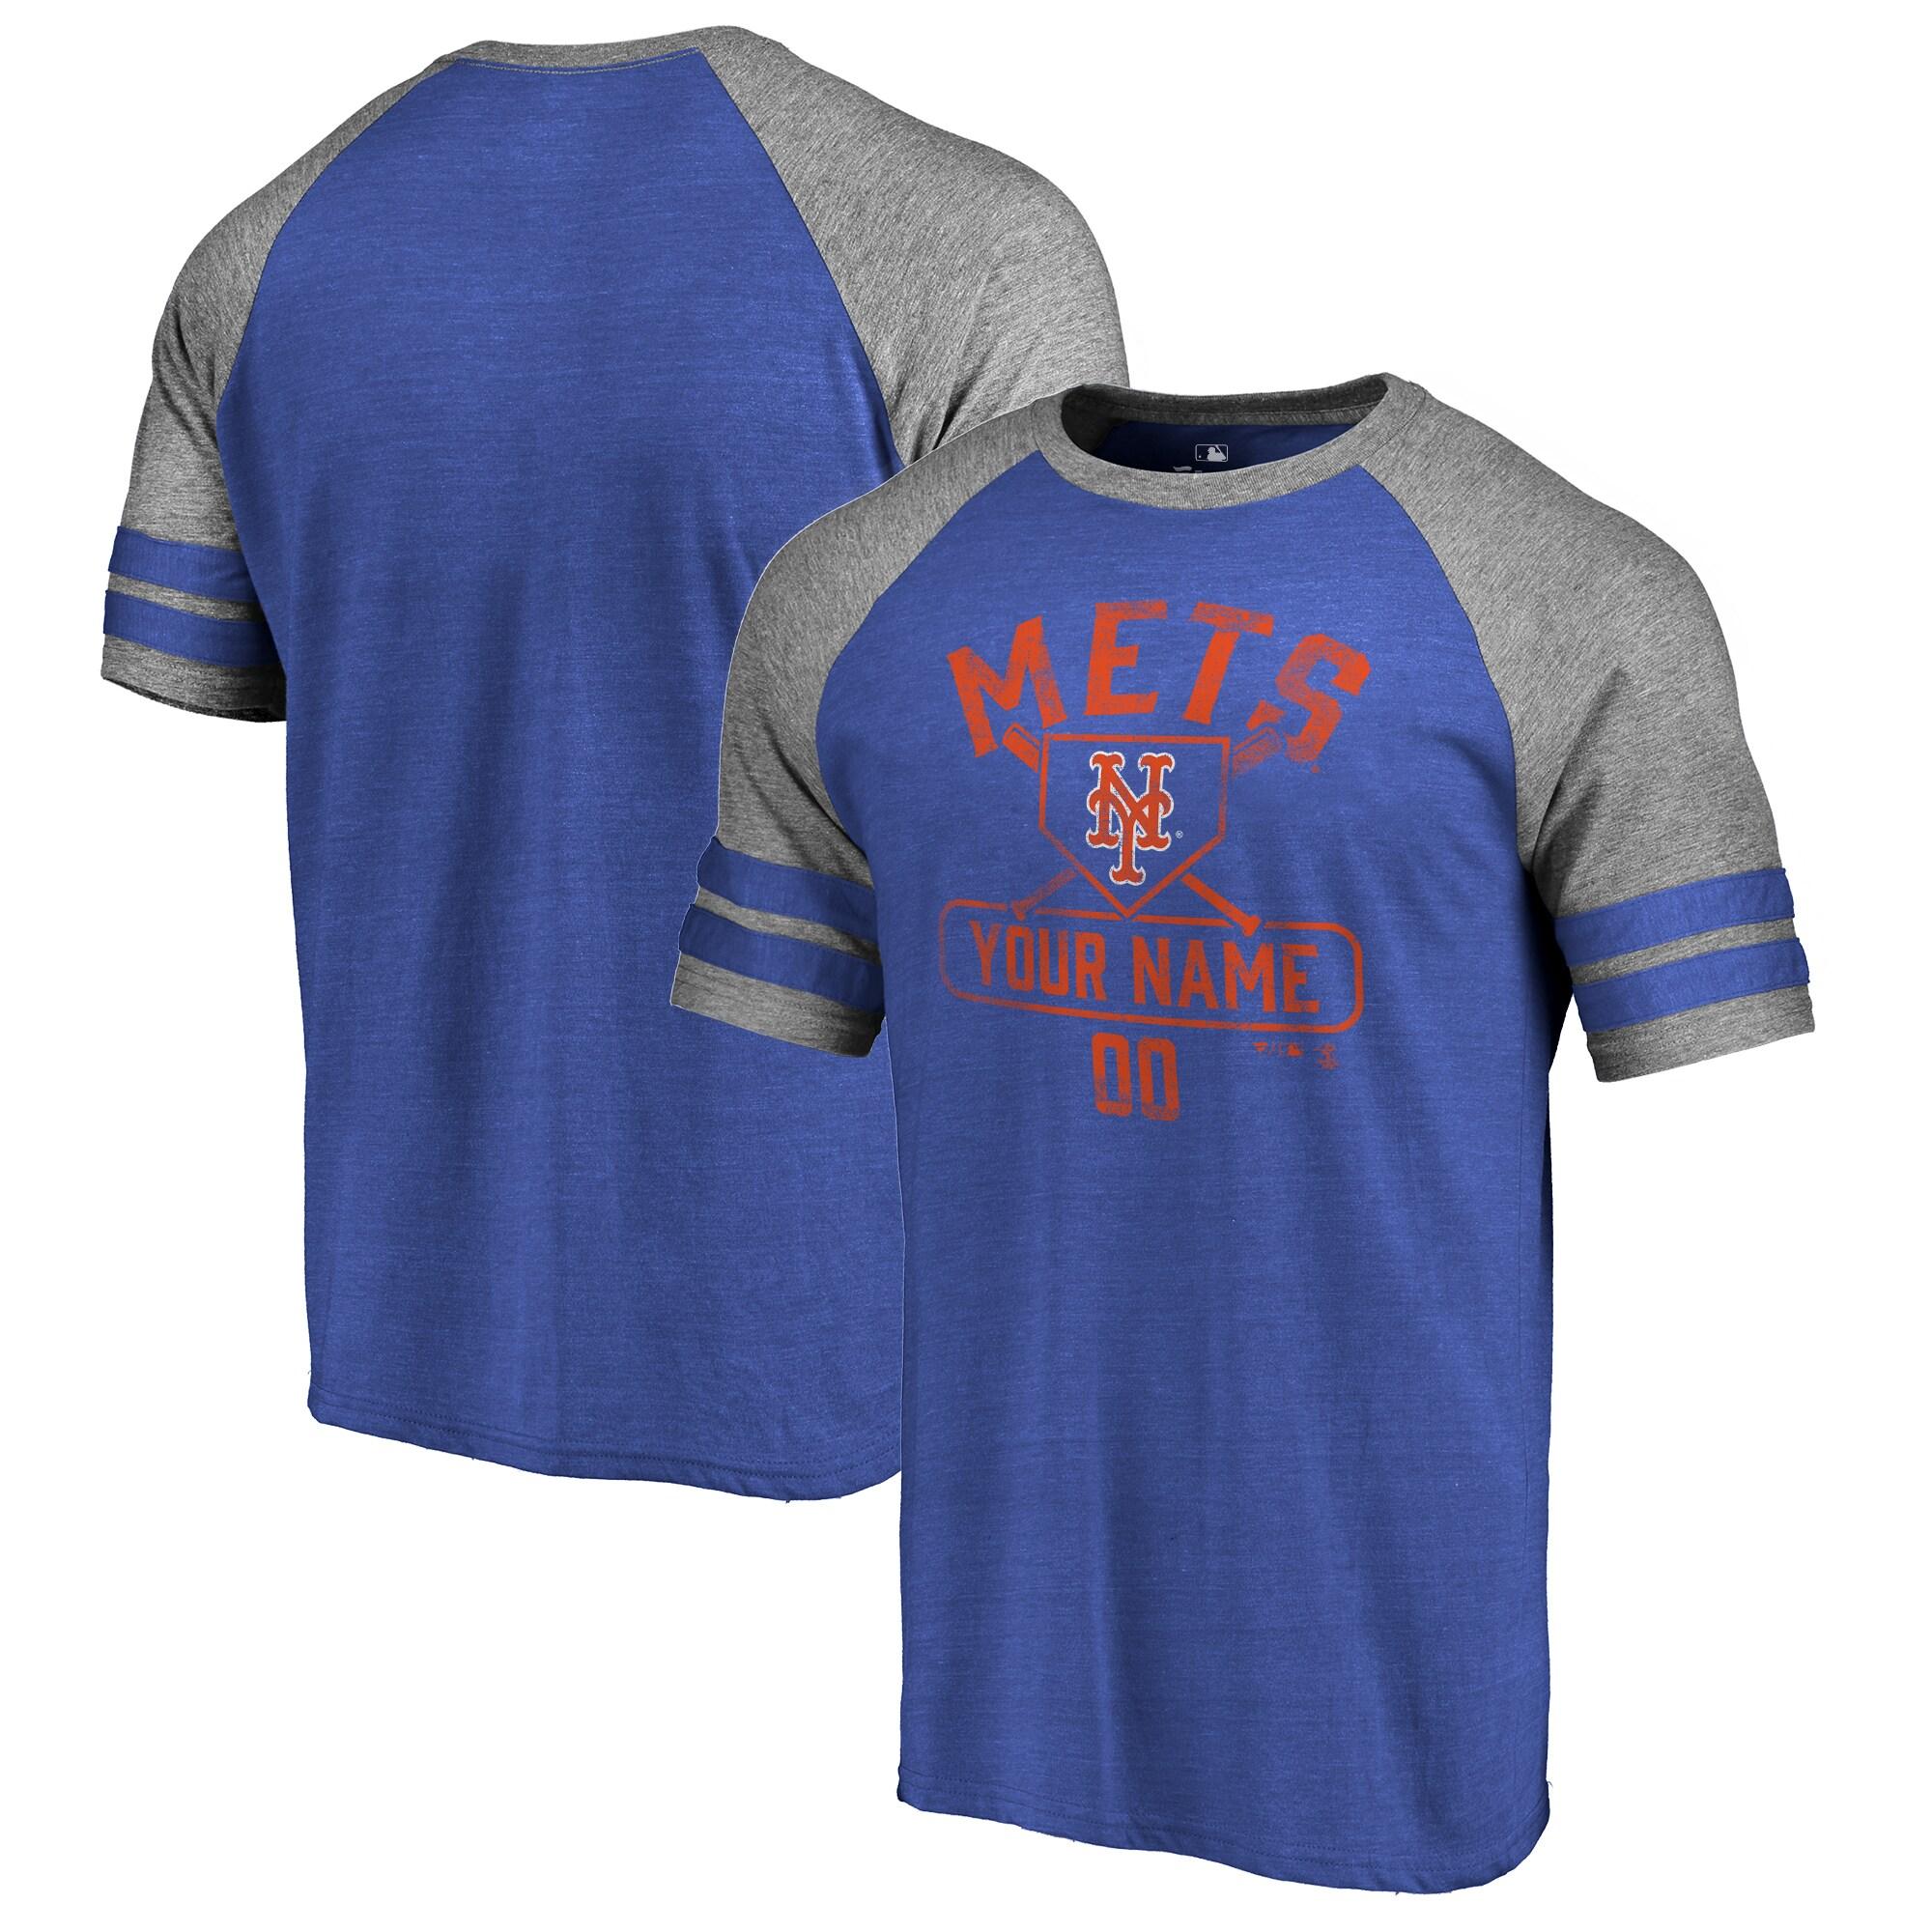 New York Mets Fanatics Branded Personalized Base Runner Tri-Blend Raglan T-Shirt - Royal/Ash